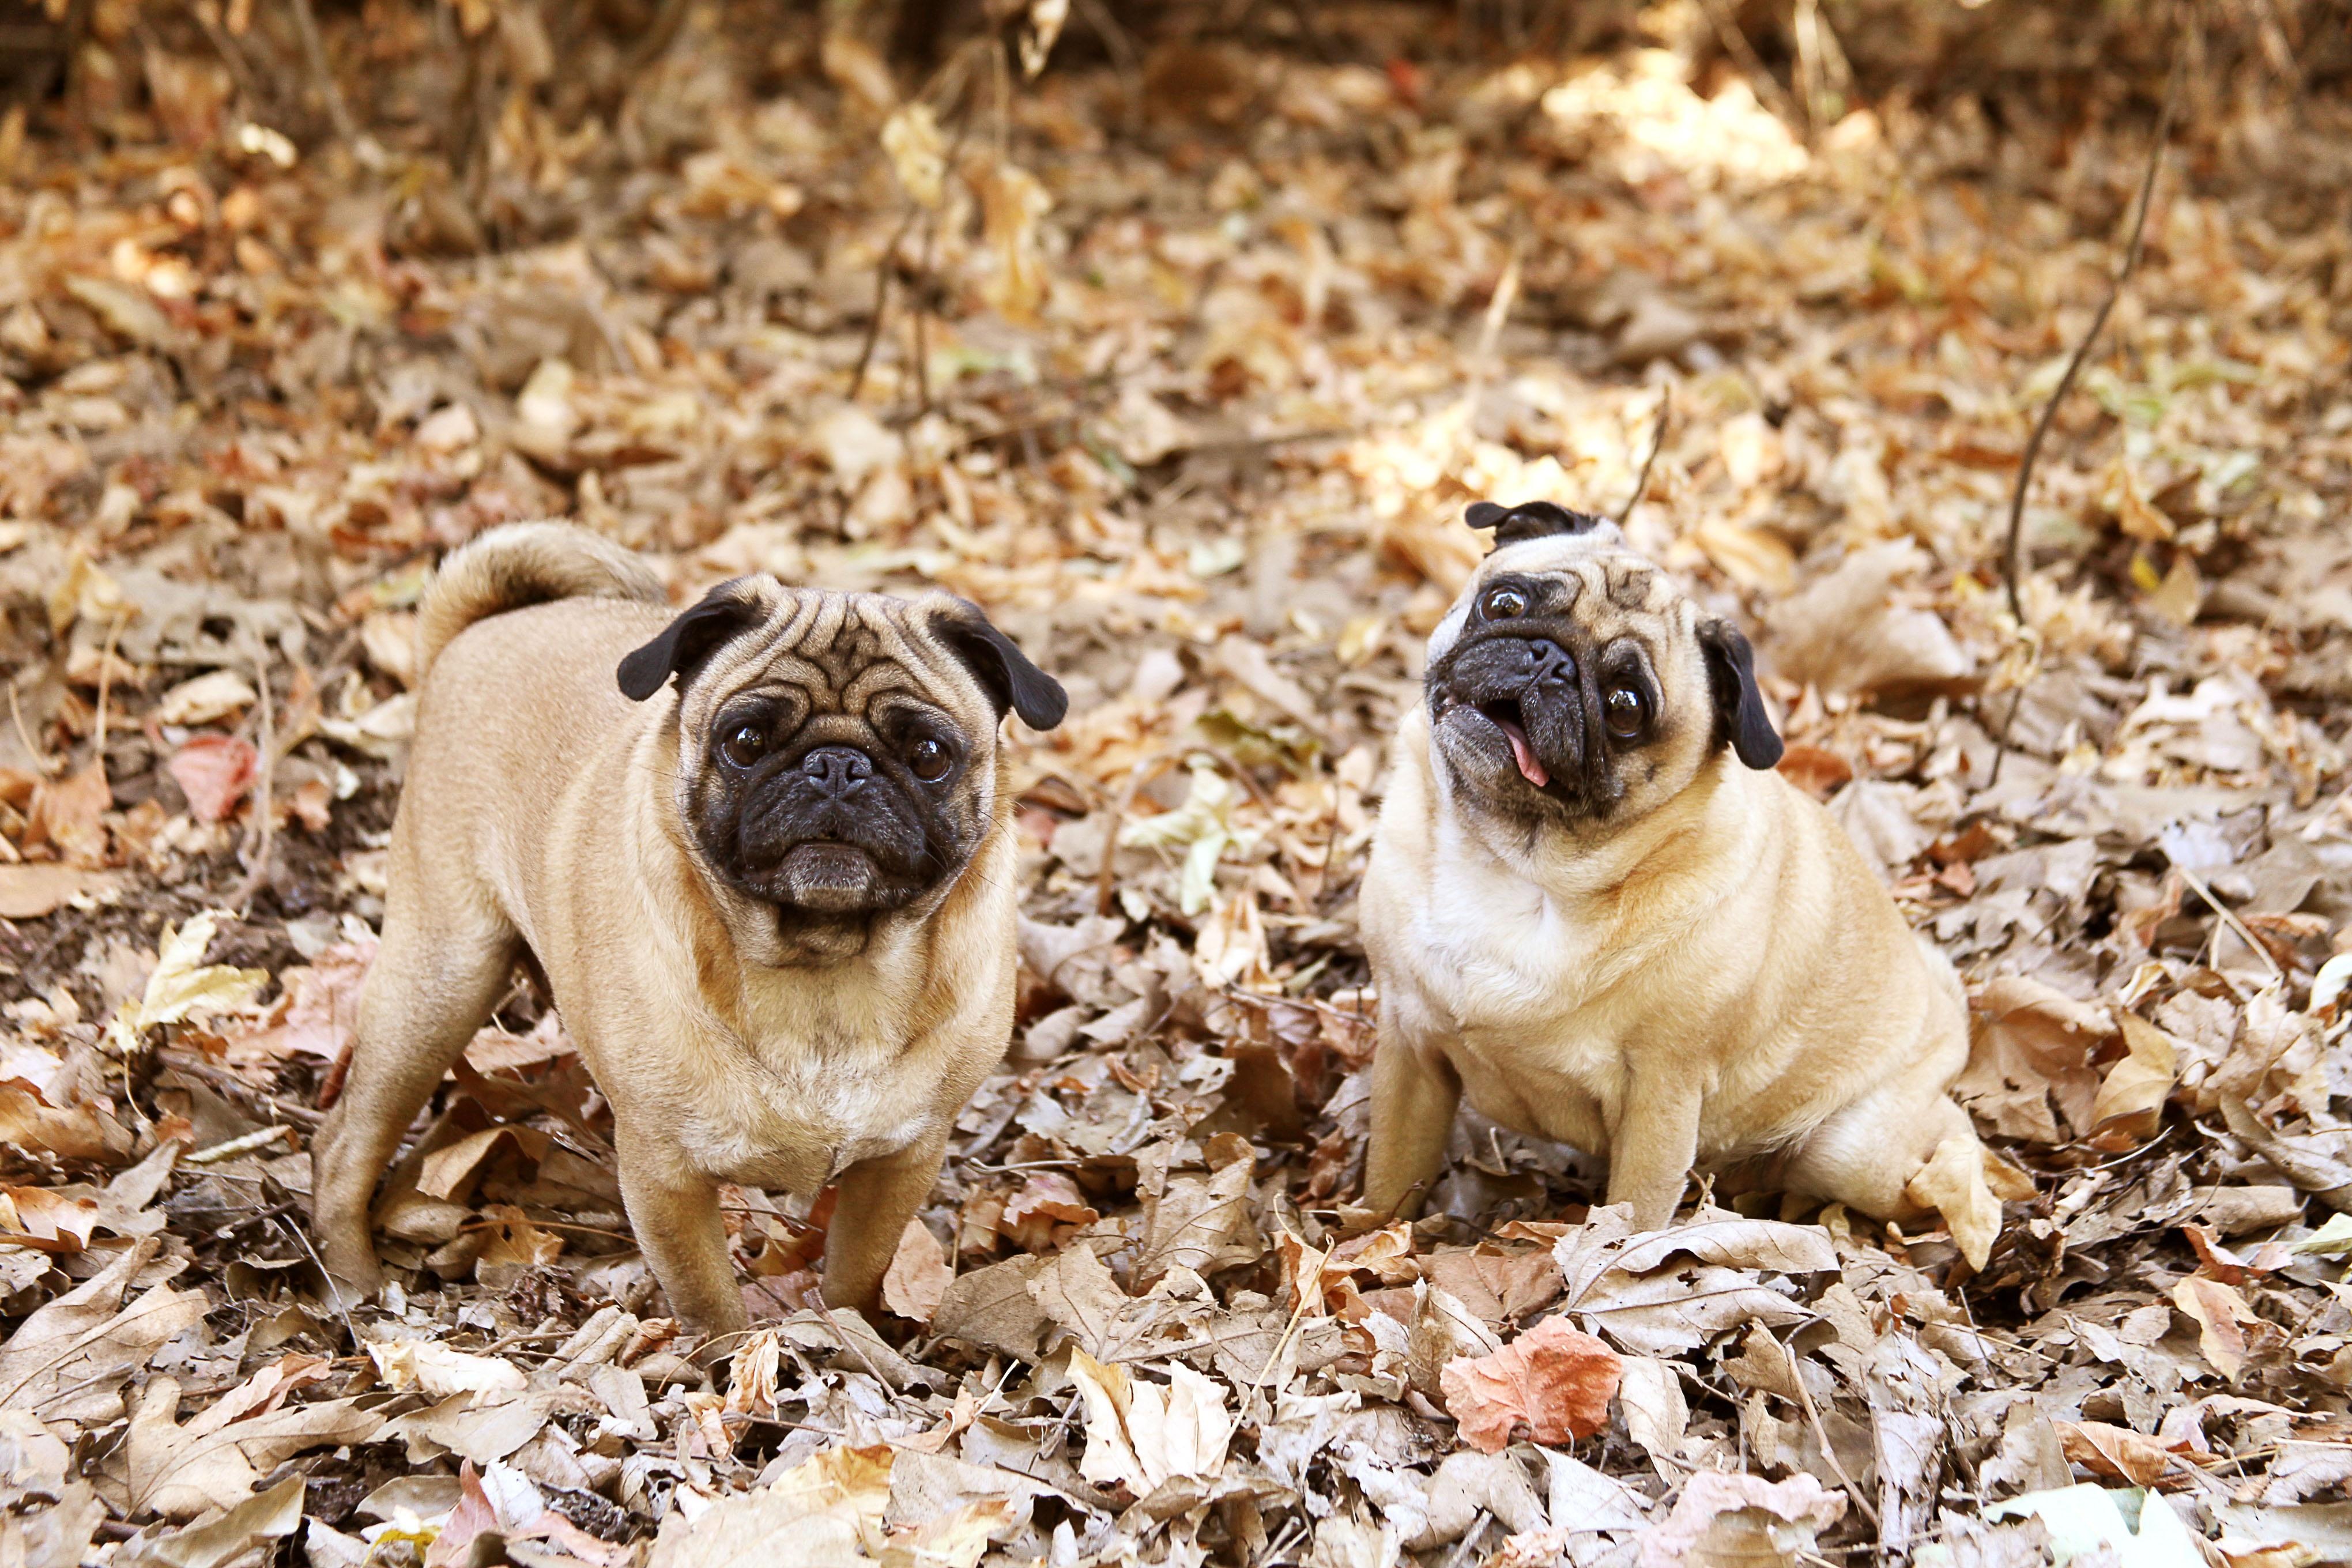 Top Pug Canine Adorable Dog - fall-puppy-dog-cute-canine-looking-portrait-small-mammal-friendship-together-pug-leaves-vertebrate-adorable-dog-breed-purebred-pedigree-dog-like-mammal-dog-crossbreeds-1391380  HD_1710065  .jpg